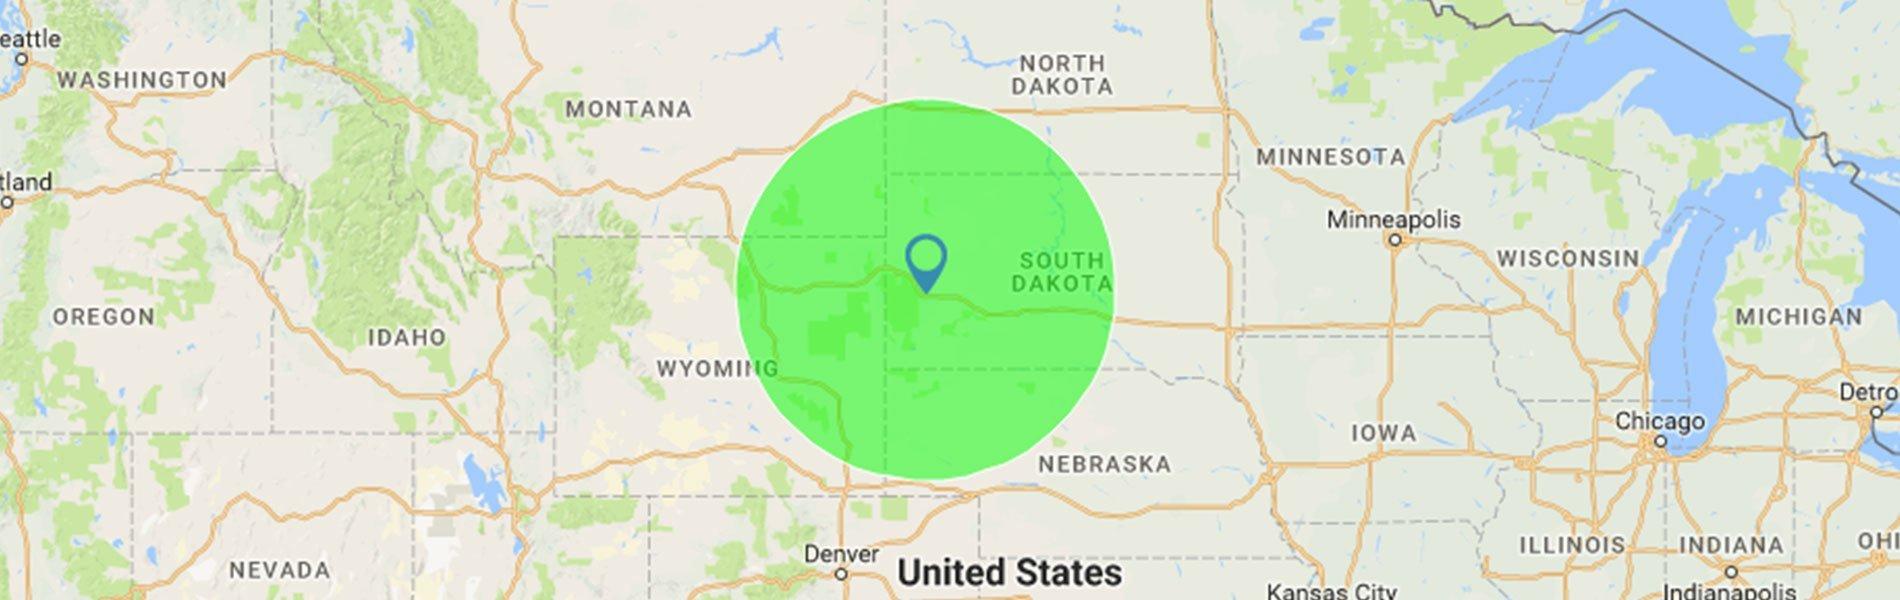 Dakota Insulation _ 605-645-4720